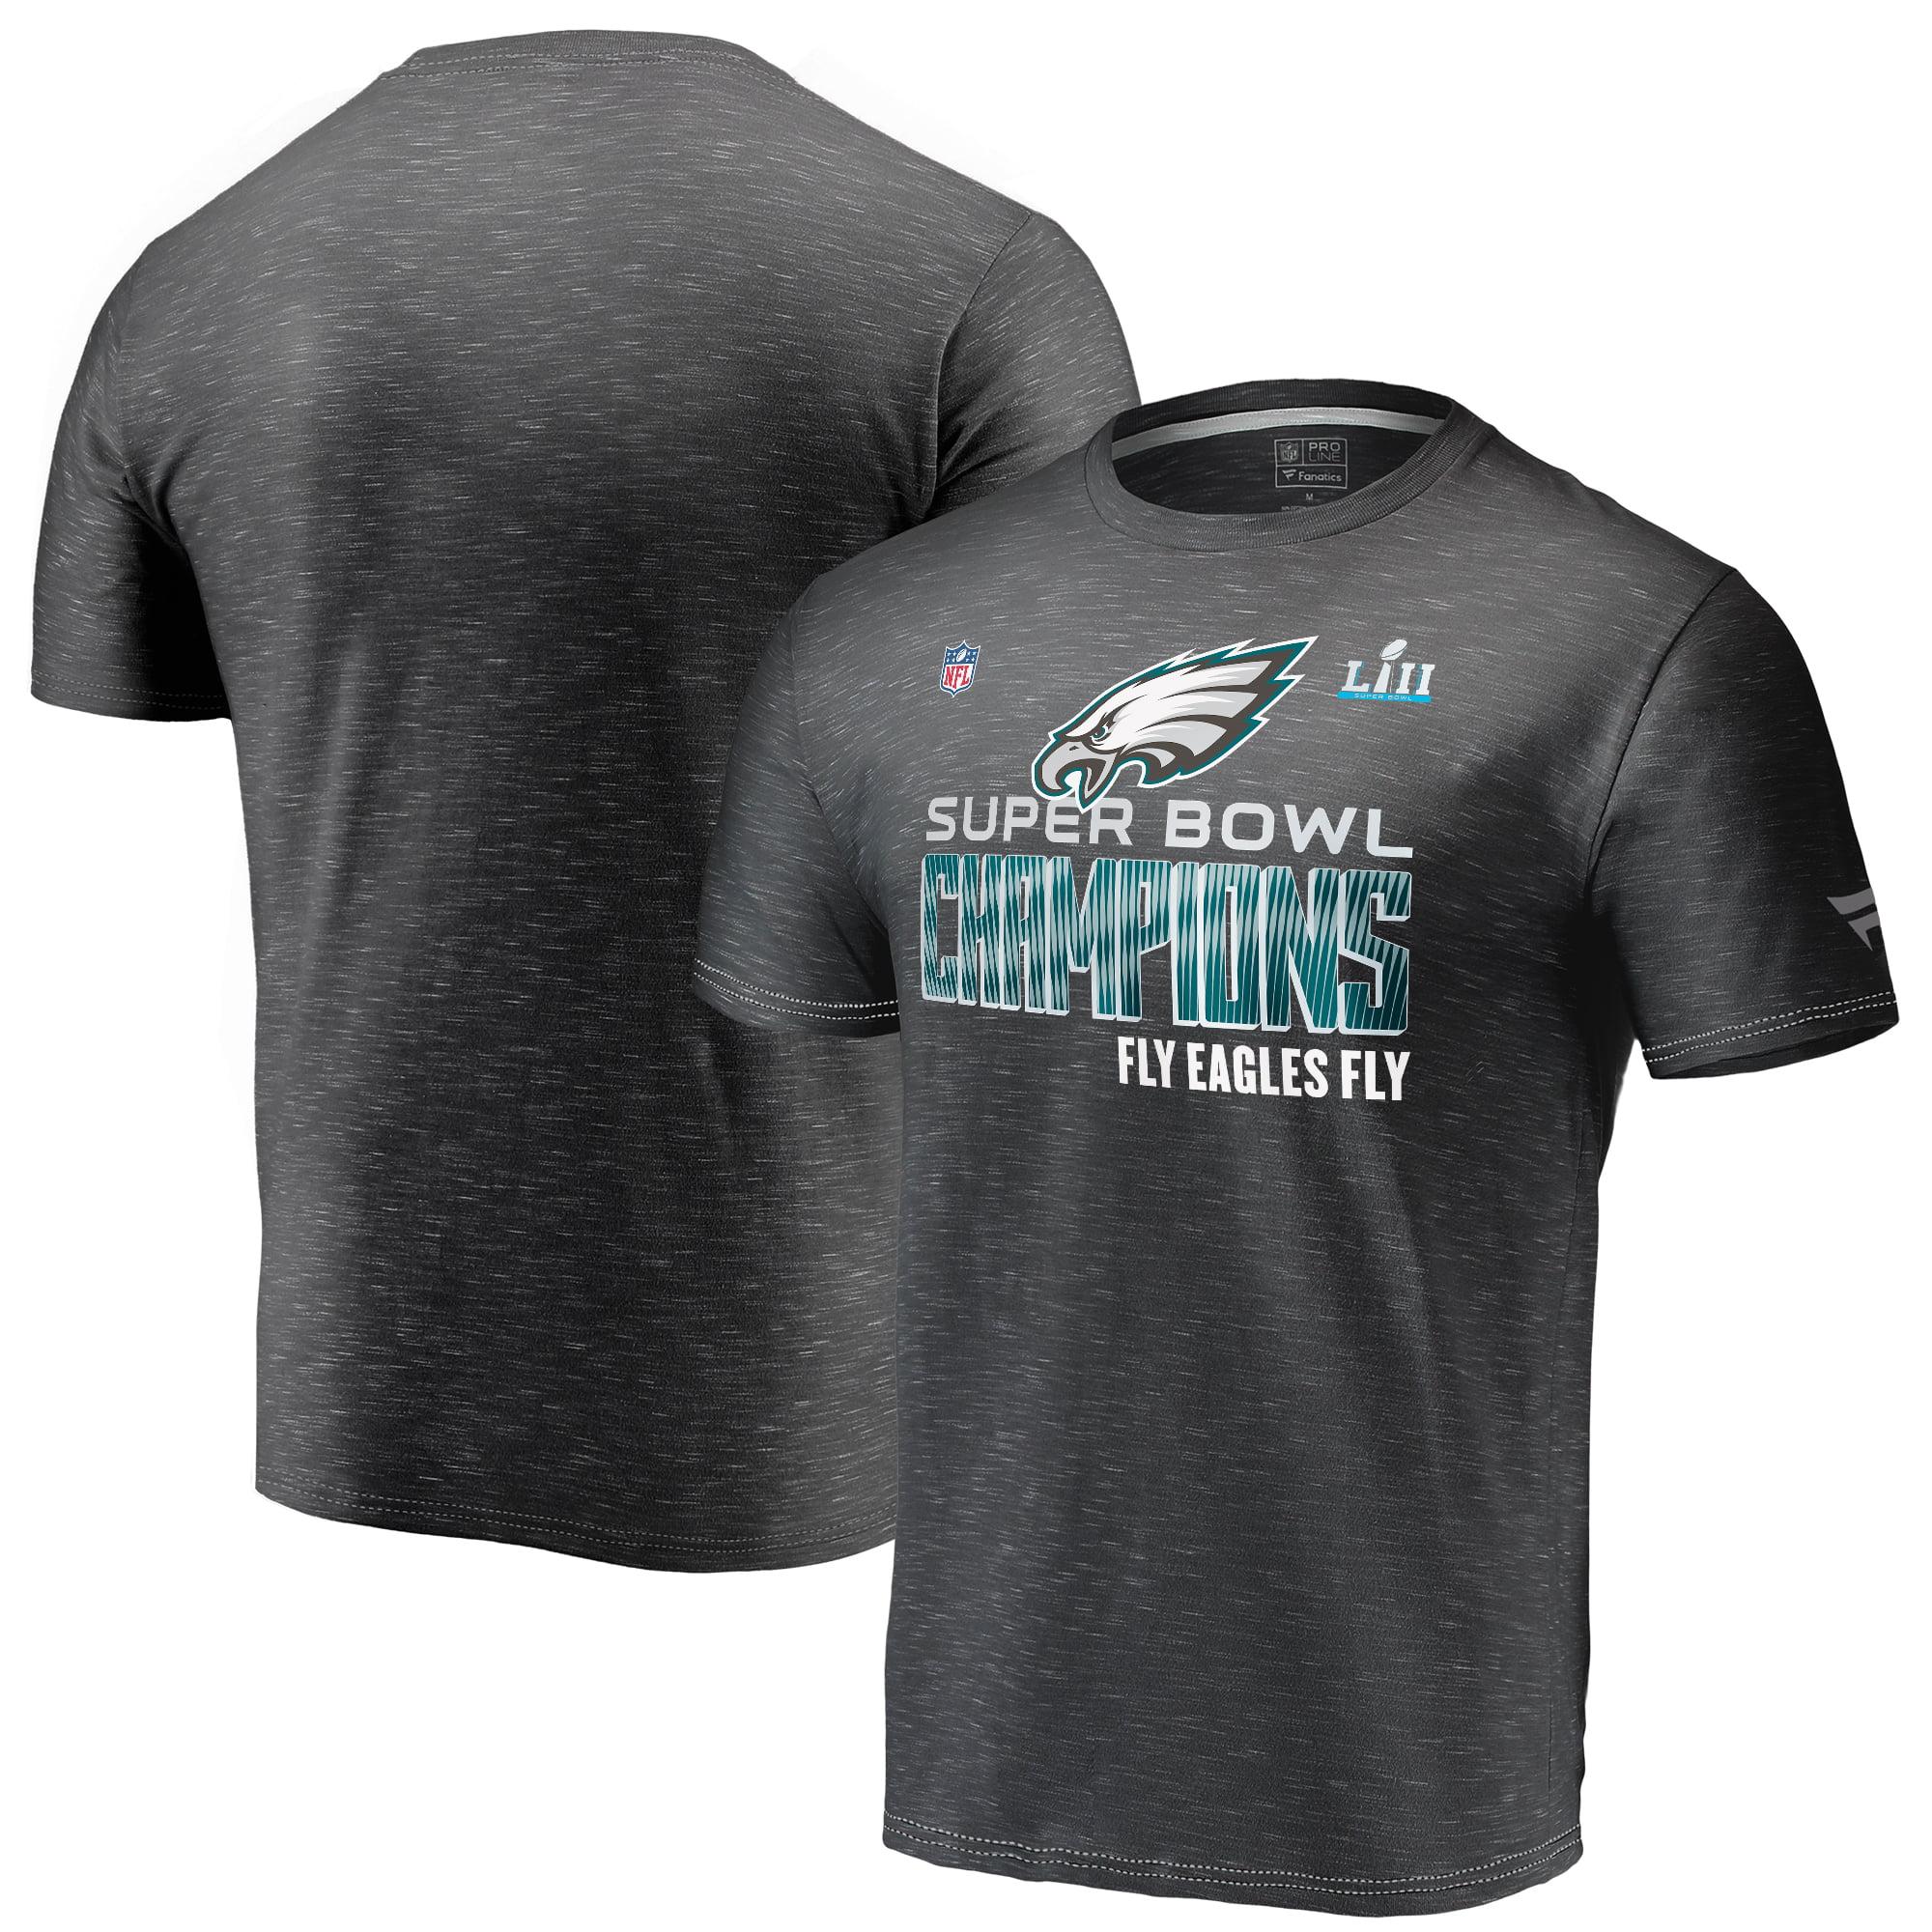 Philadelphia Eagles NFL Pro Line by Fanatics Branded Super Bowl LII Champions Trophy Collection Locker Room T-Shirt - Heather Black